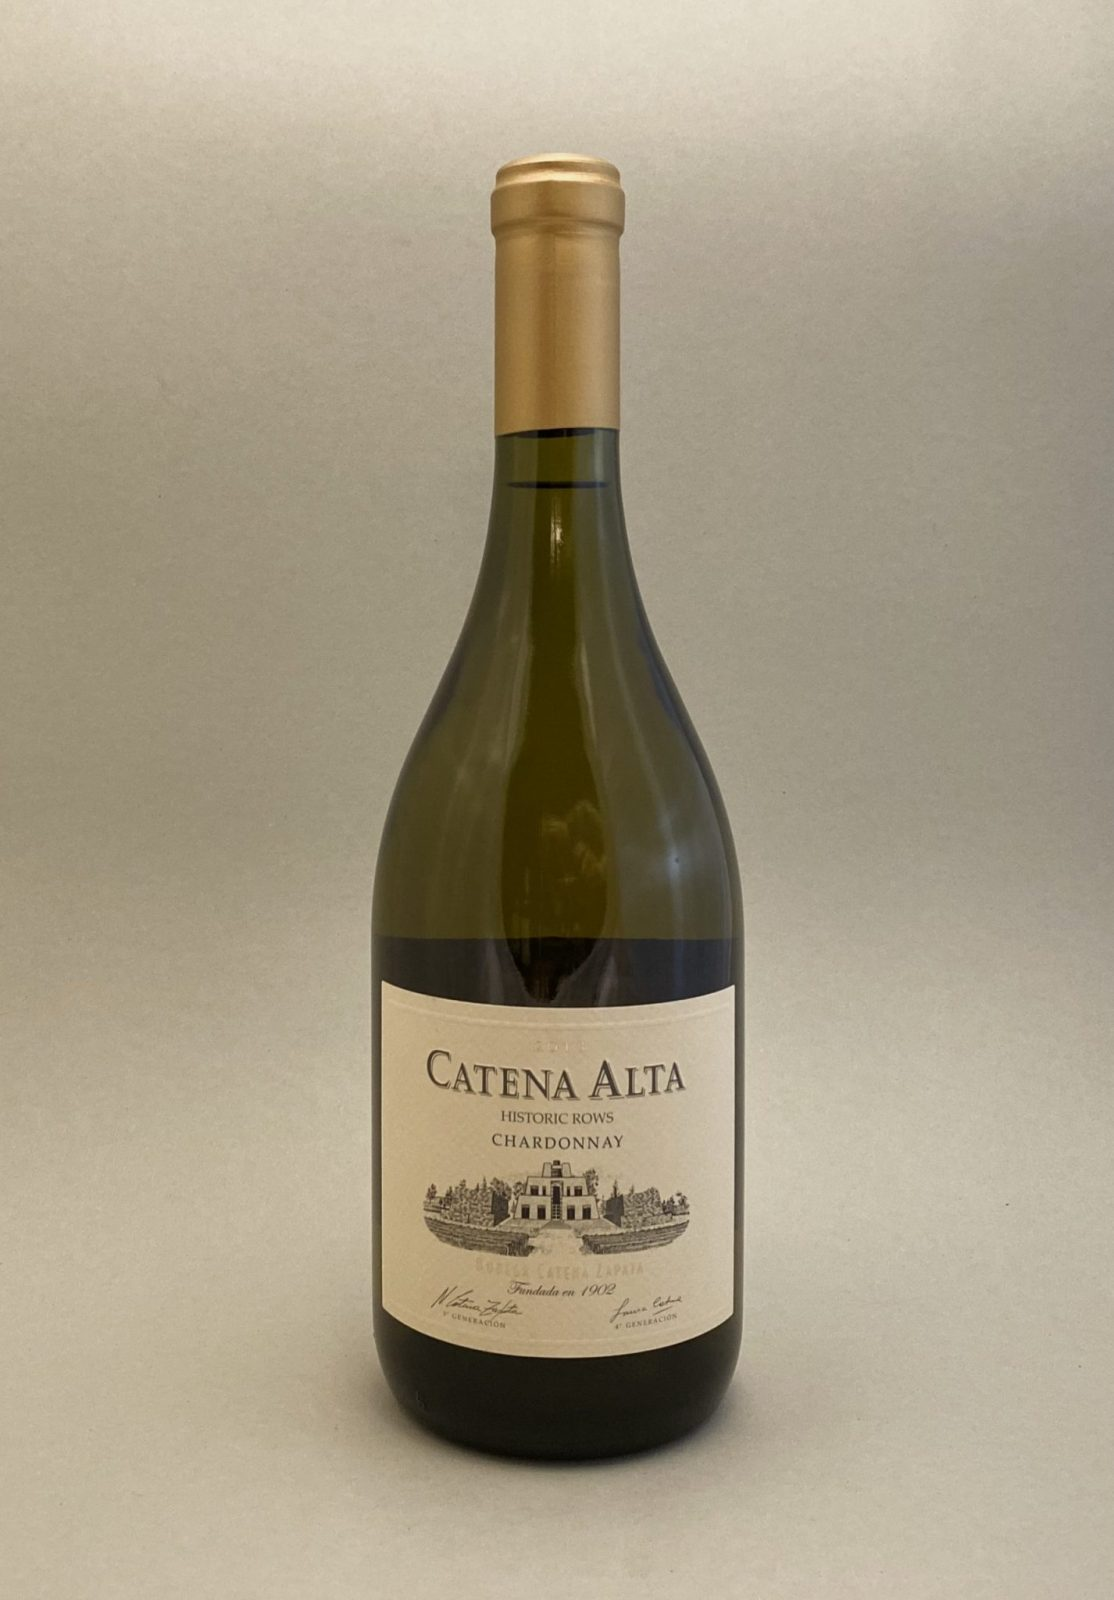 CATENA ALTA Chardonnay 0,75l, vinoteka slnecnice Bratislava mesto, petrzalka, vino biele z Argentiny